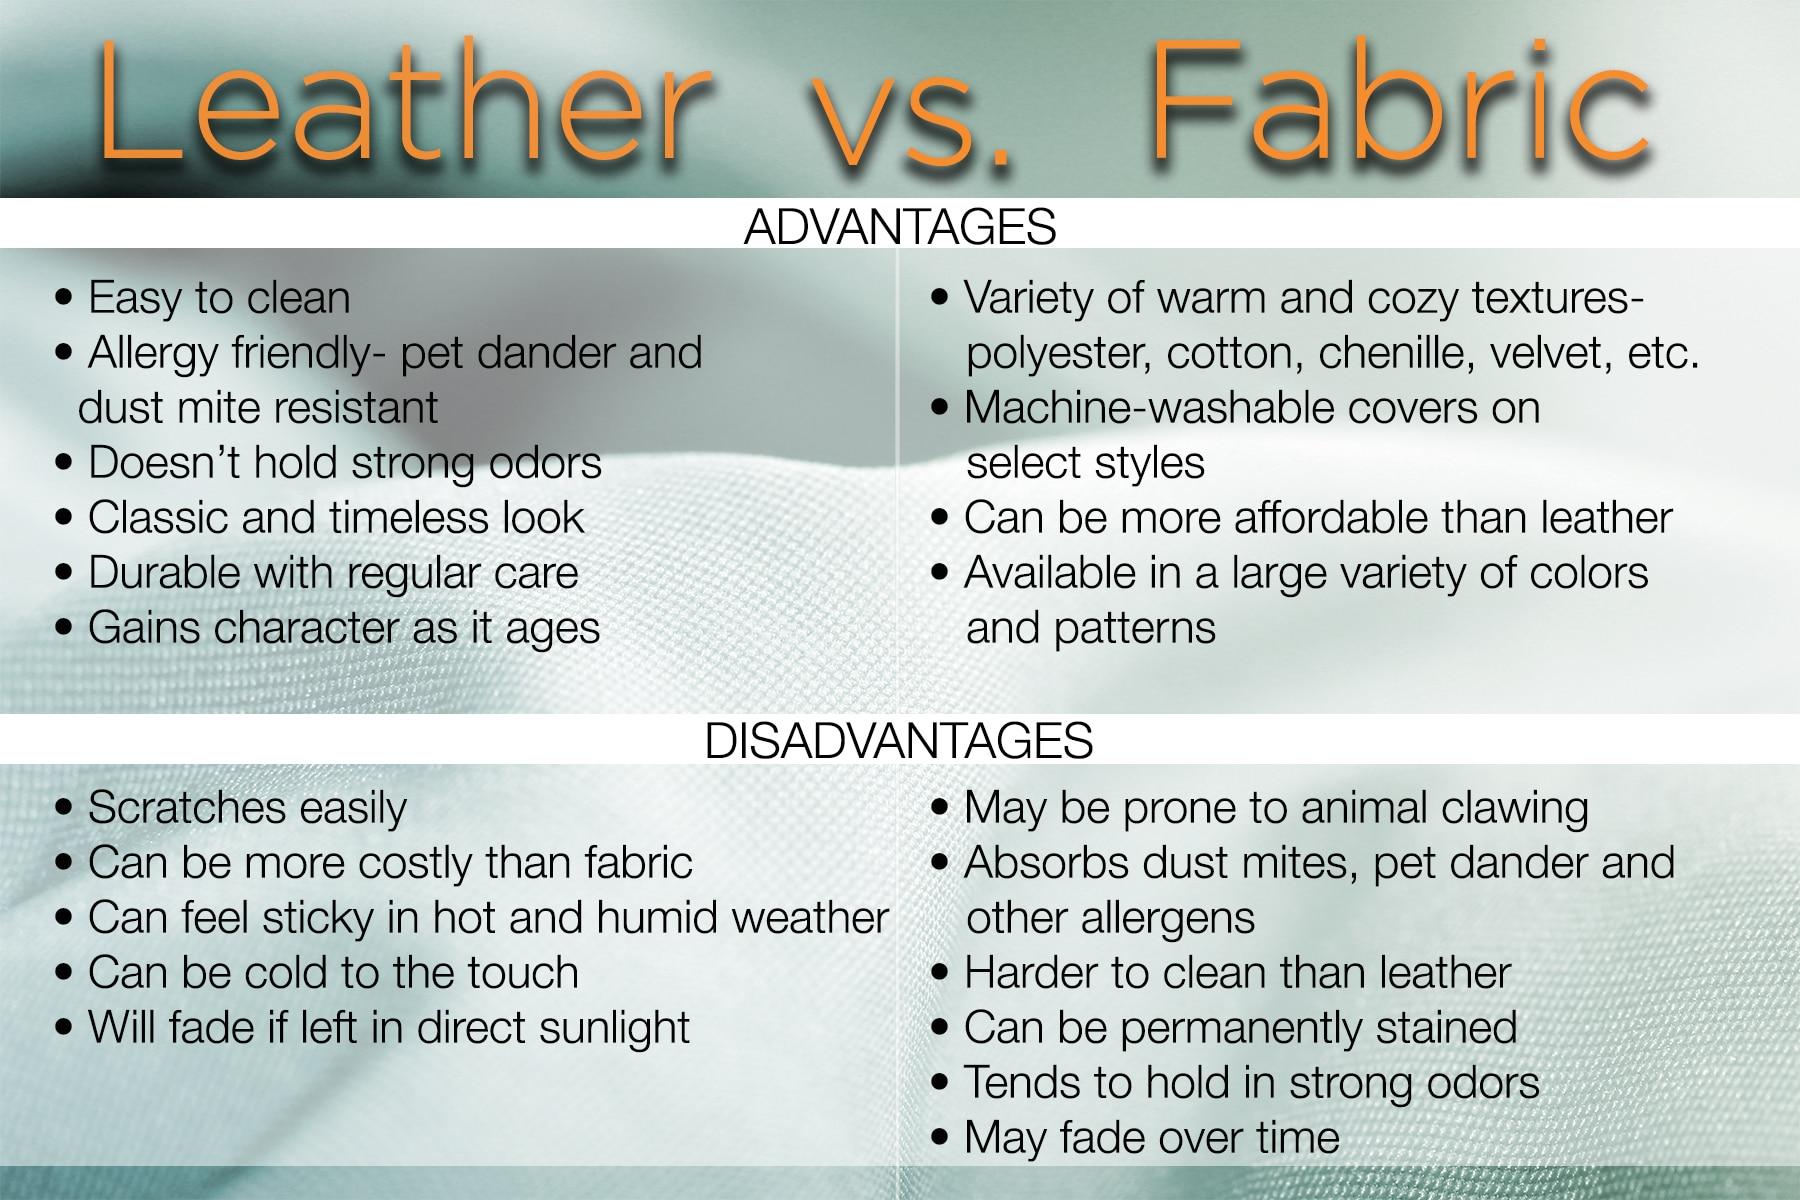 Leather vs. Fabric